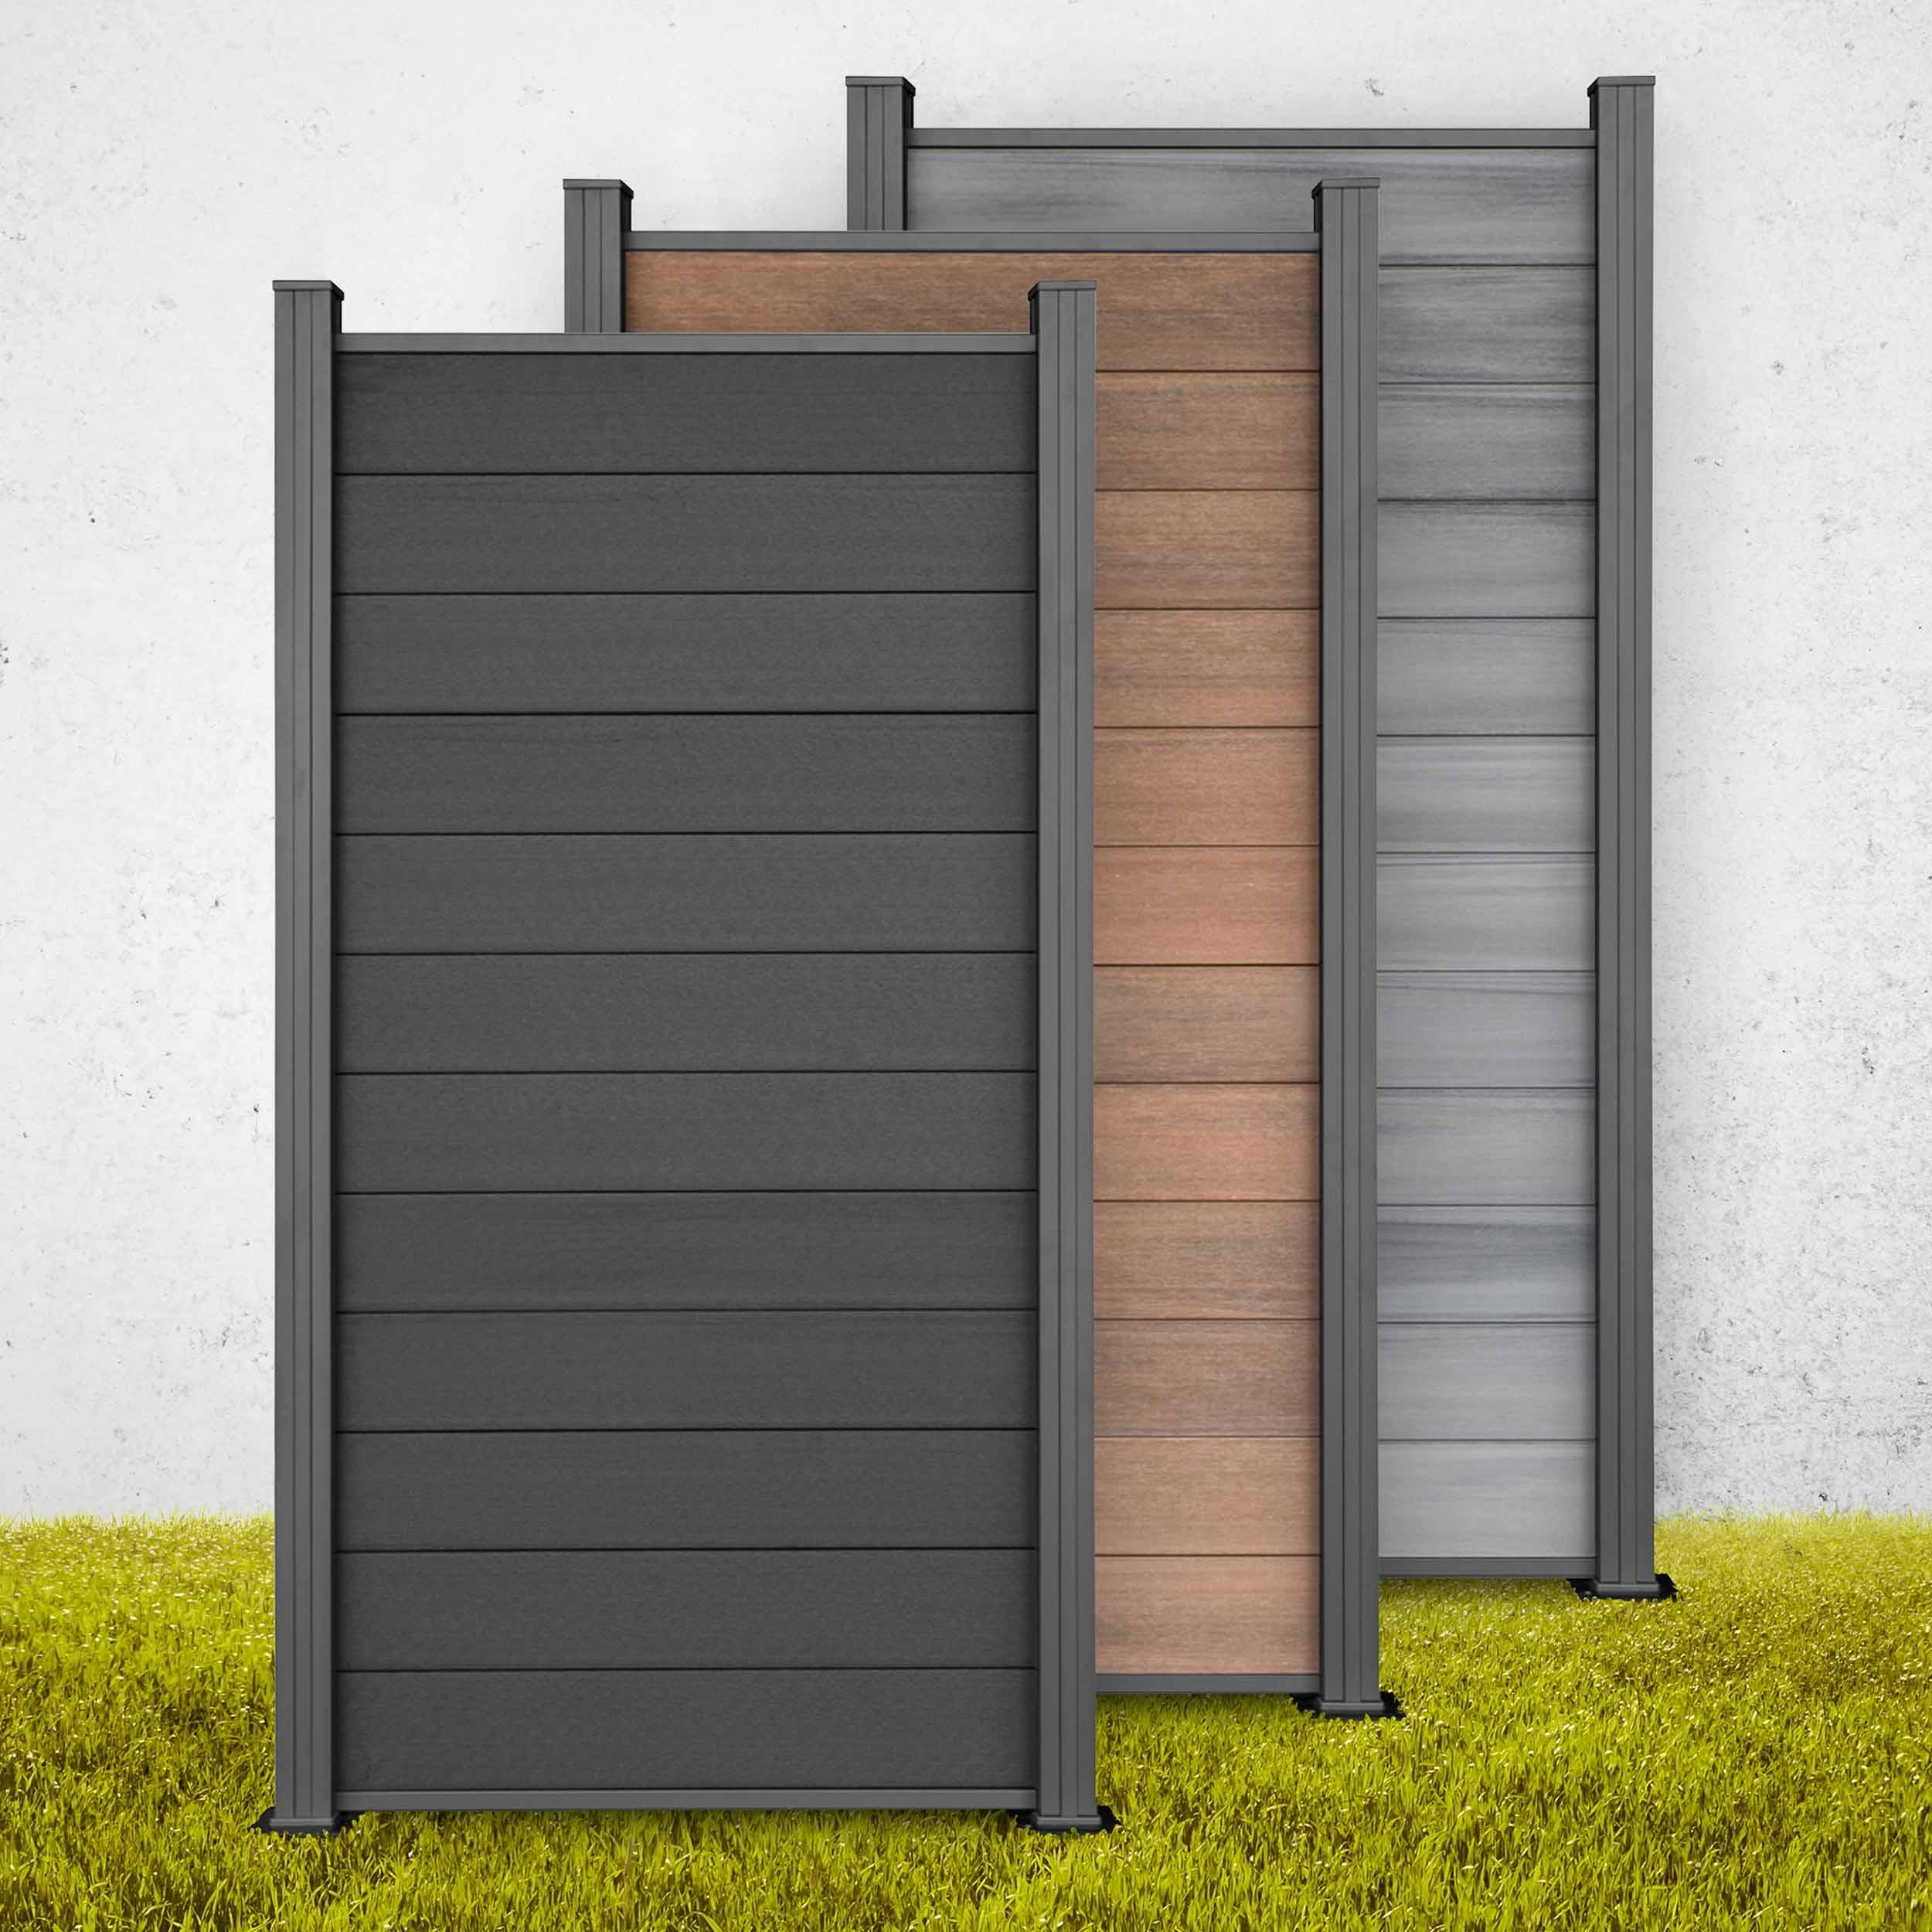 Wpc Terrasse Grau Holz Wandverkleidung Teak Grau Braun Bs